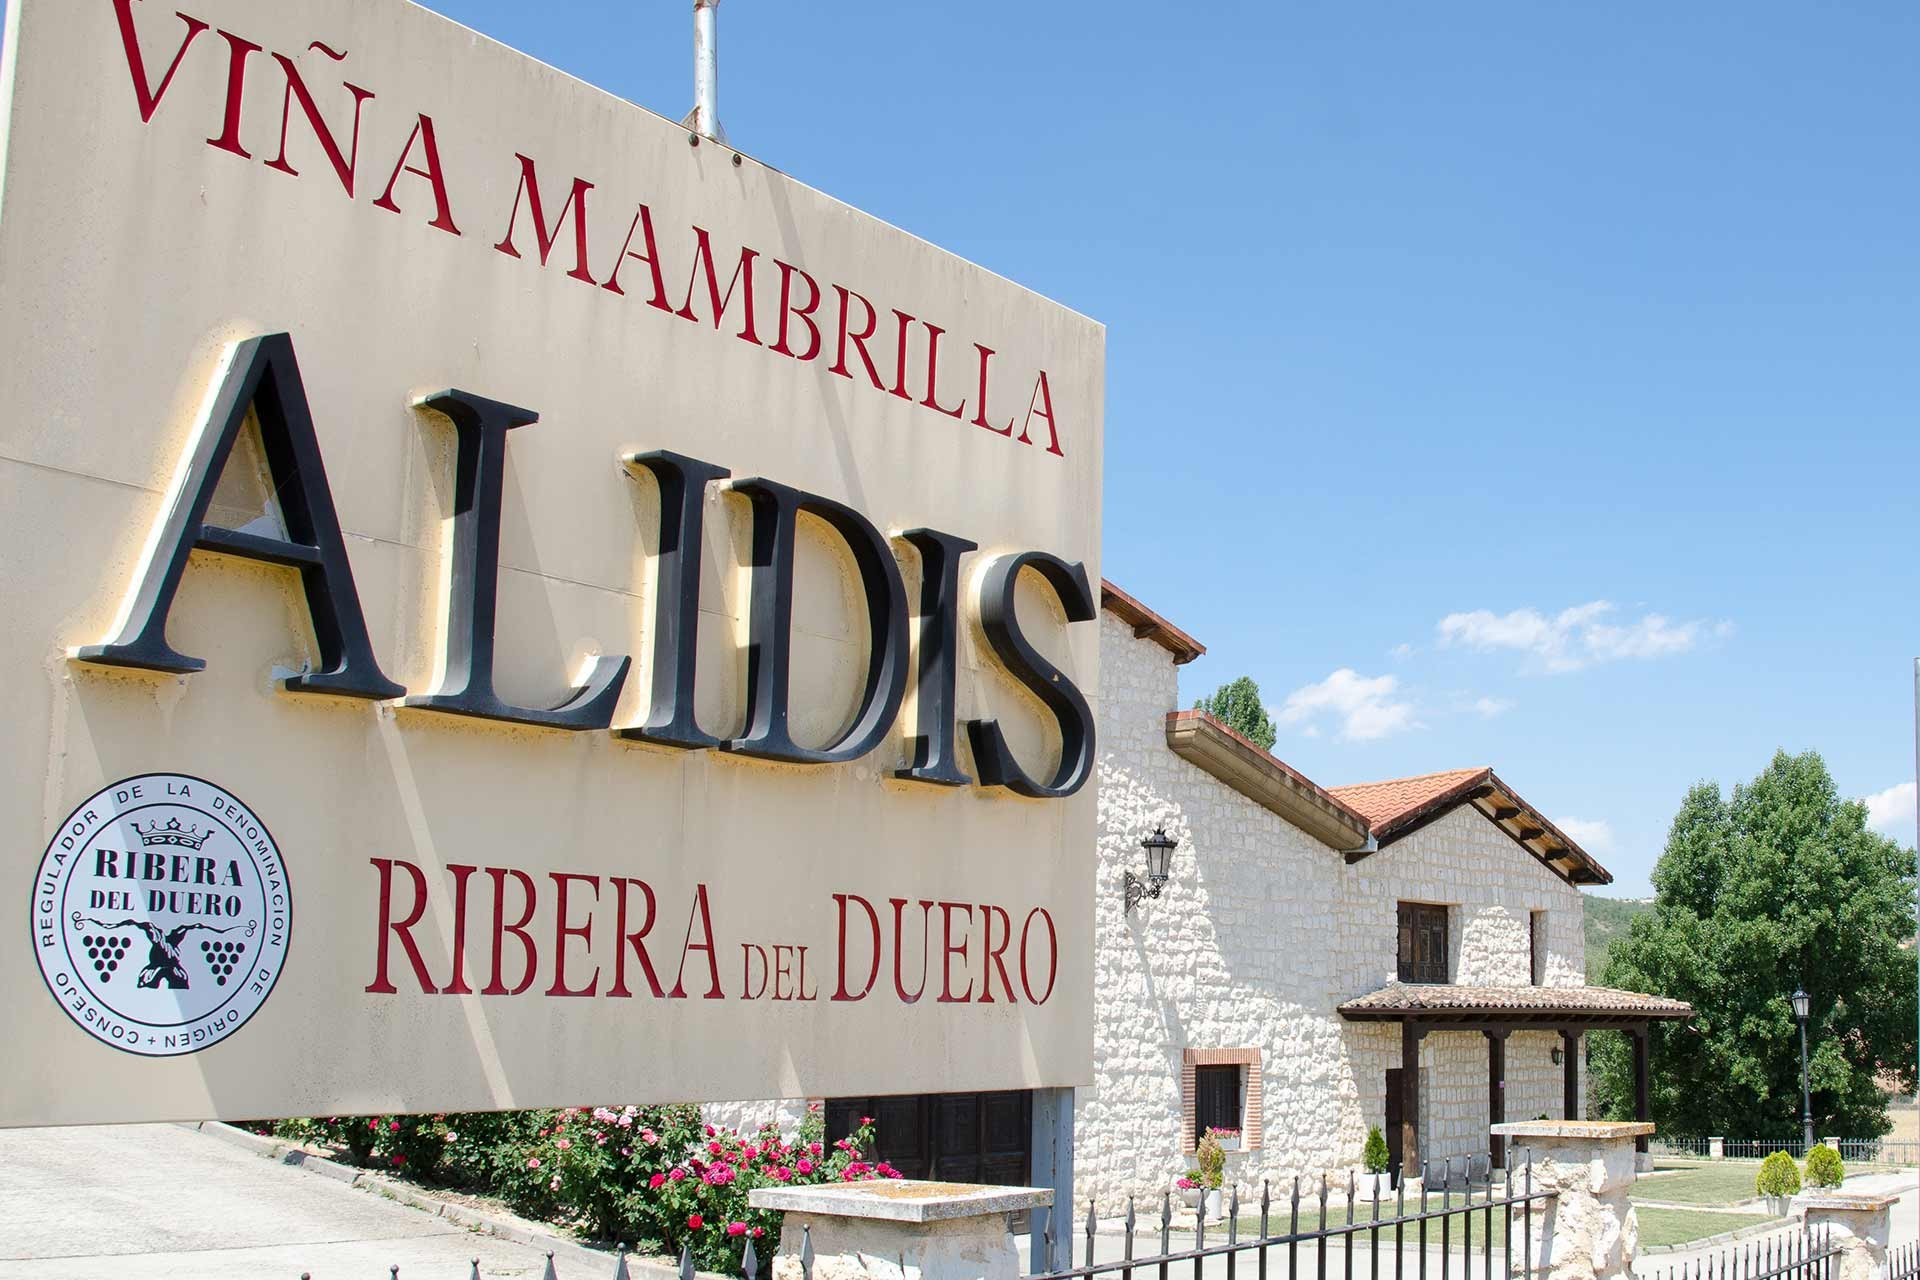 Viña Mambrilla y vino Alidis